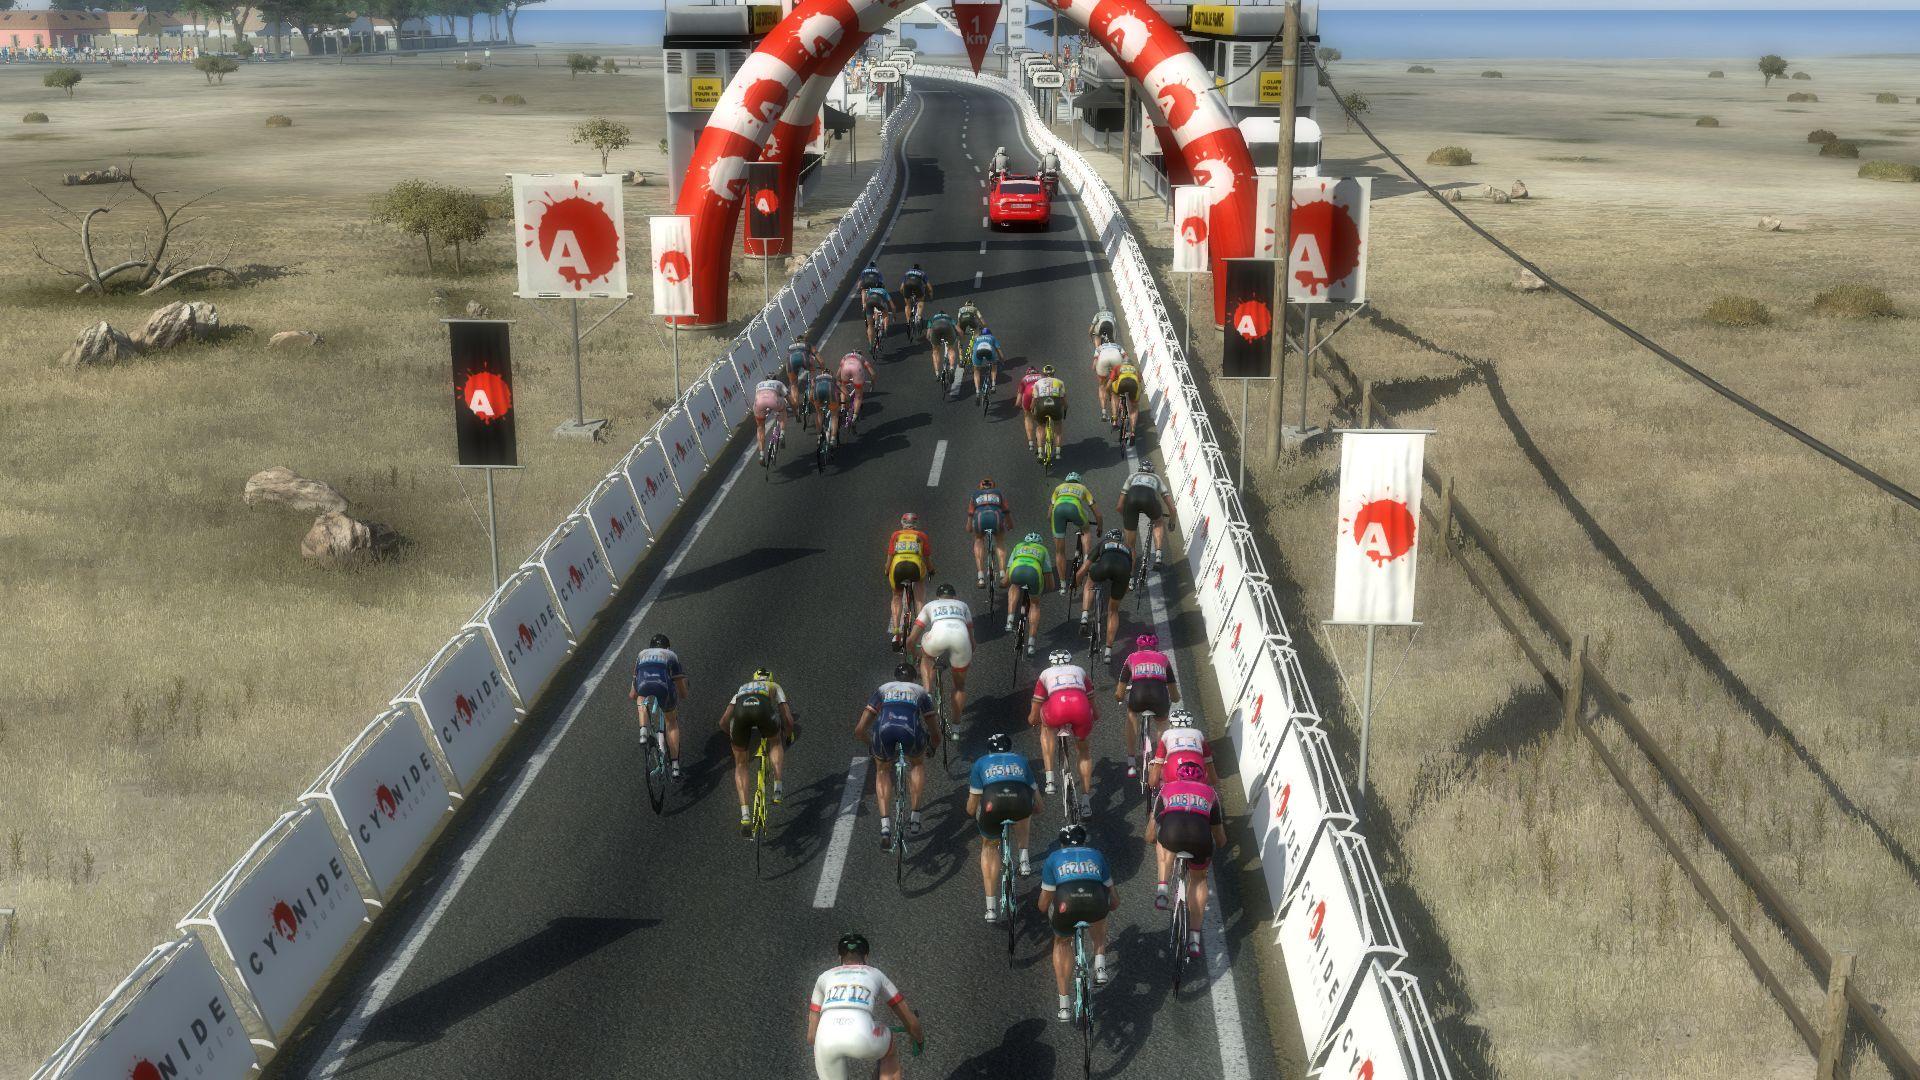 pcmdaily.com/images/mg/2019/Races/PT/Qatar/mg19_qat_s03_13.jpg